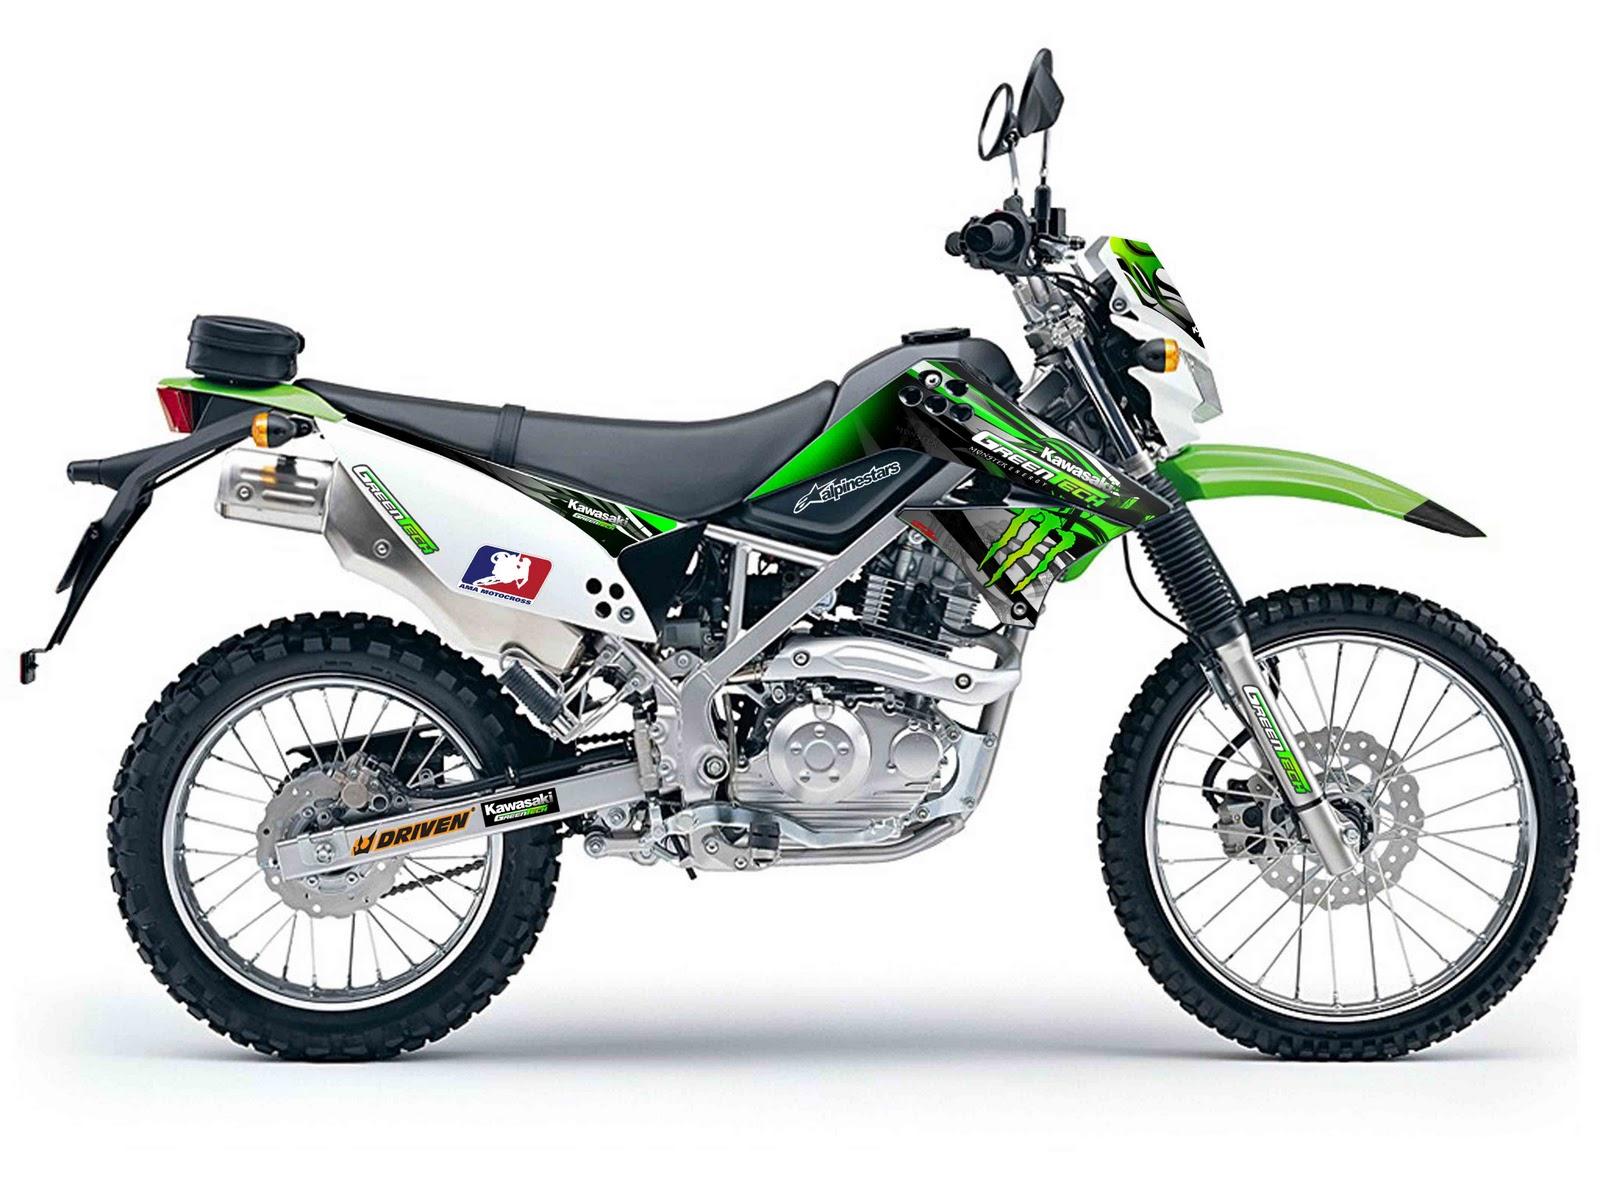 99 Gambar Motor Kawasaki Ninja Ss Terbaru Terlengkap Gubuk Modifikasi Knalpot R9 Racing New Mugello Klx 250 Klx250 Info Harga Spesifikasi 2016